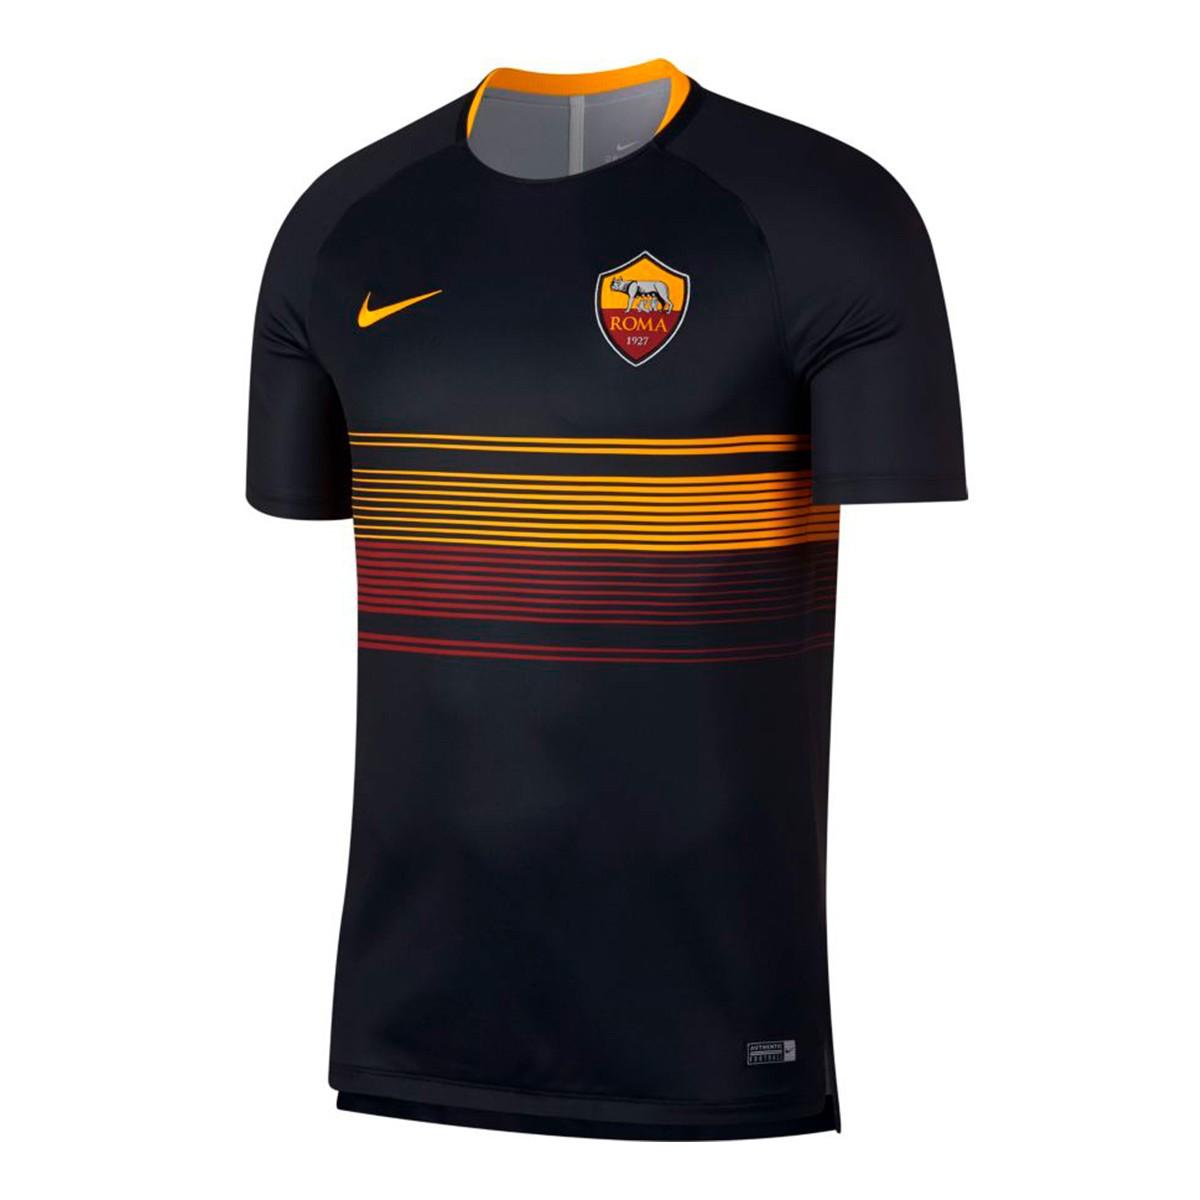 0f322c7bfcfda Jersey Nike AS Roma Squad 2018-2019 Black-University gold - Tienda ...